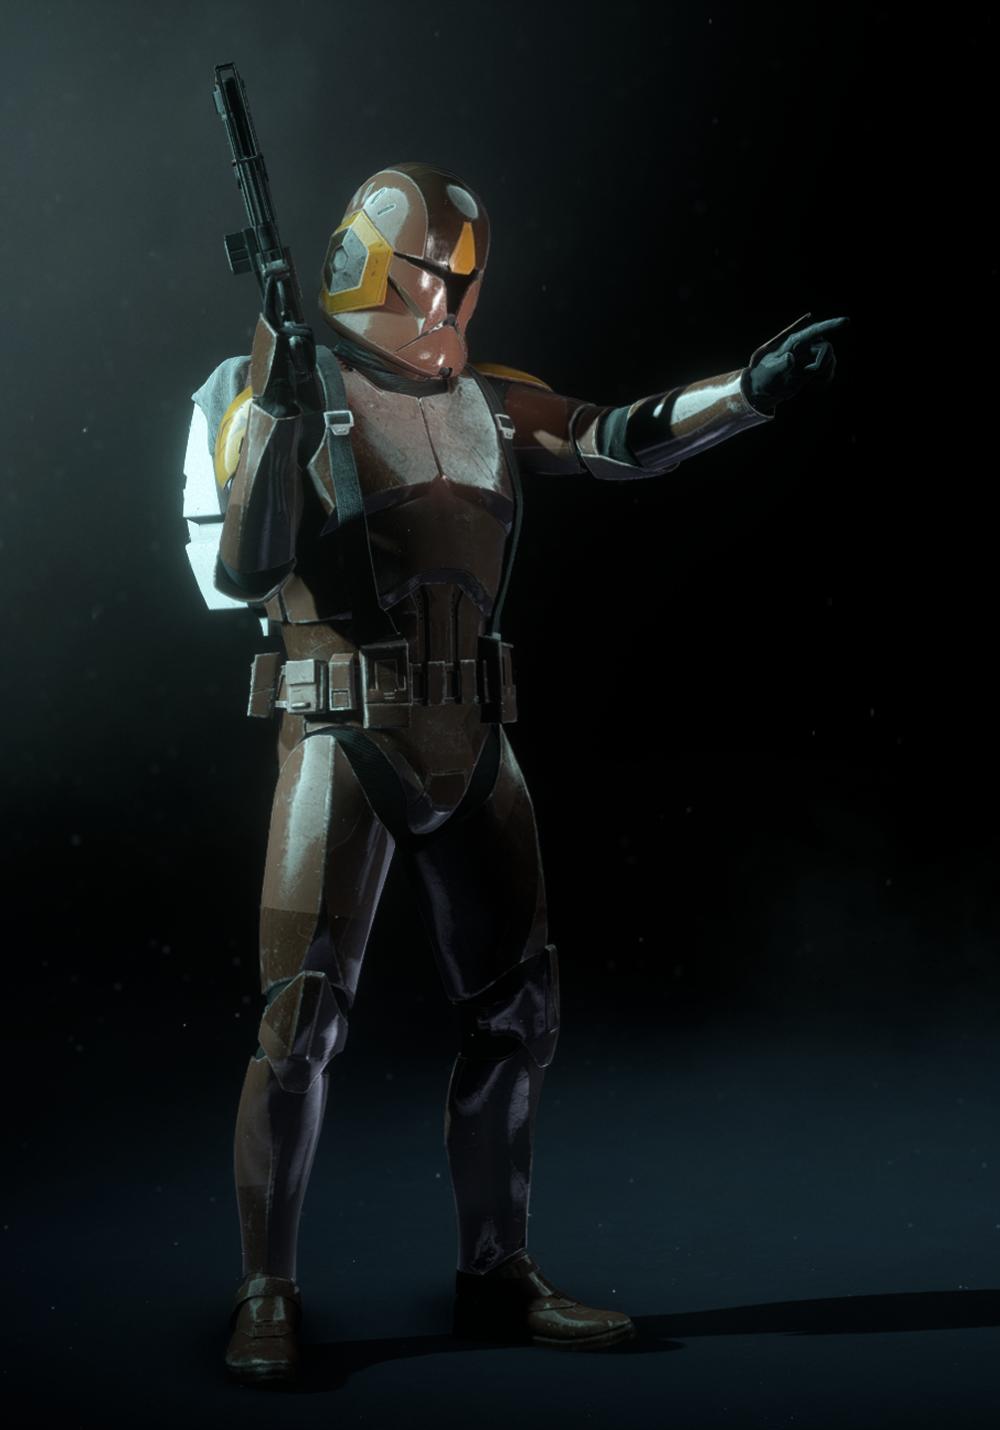 Pin On Star Wars Clones